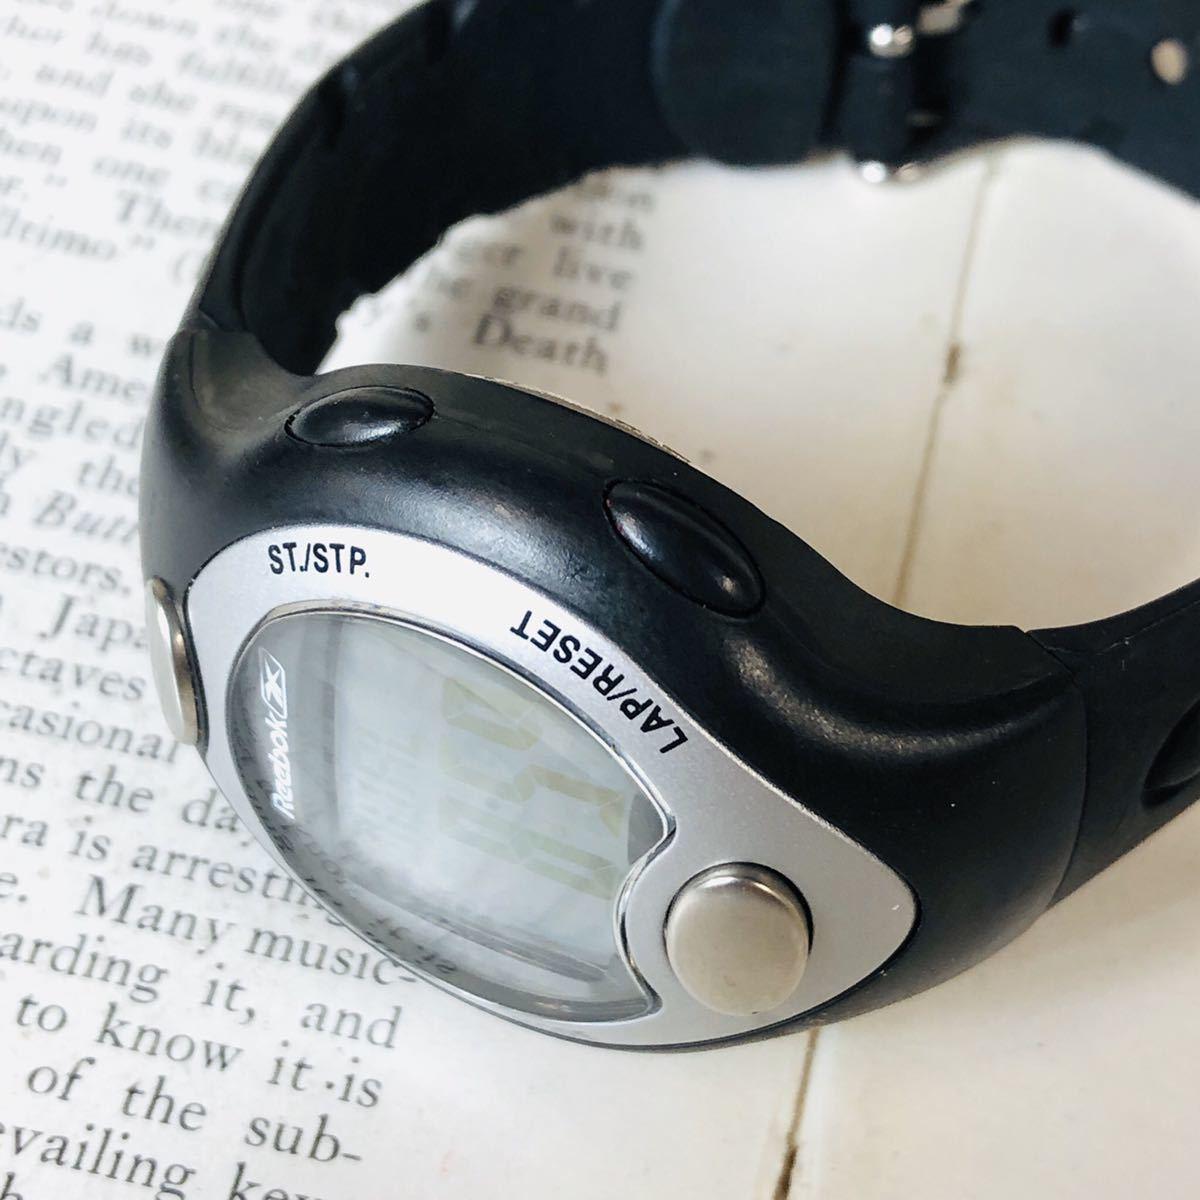 Reebok リーボック 腕時計 マットサテンシルバーカラー ブラック 心拍計 クロノ タイマー デジタル 稼動品 W730_画像4